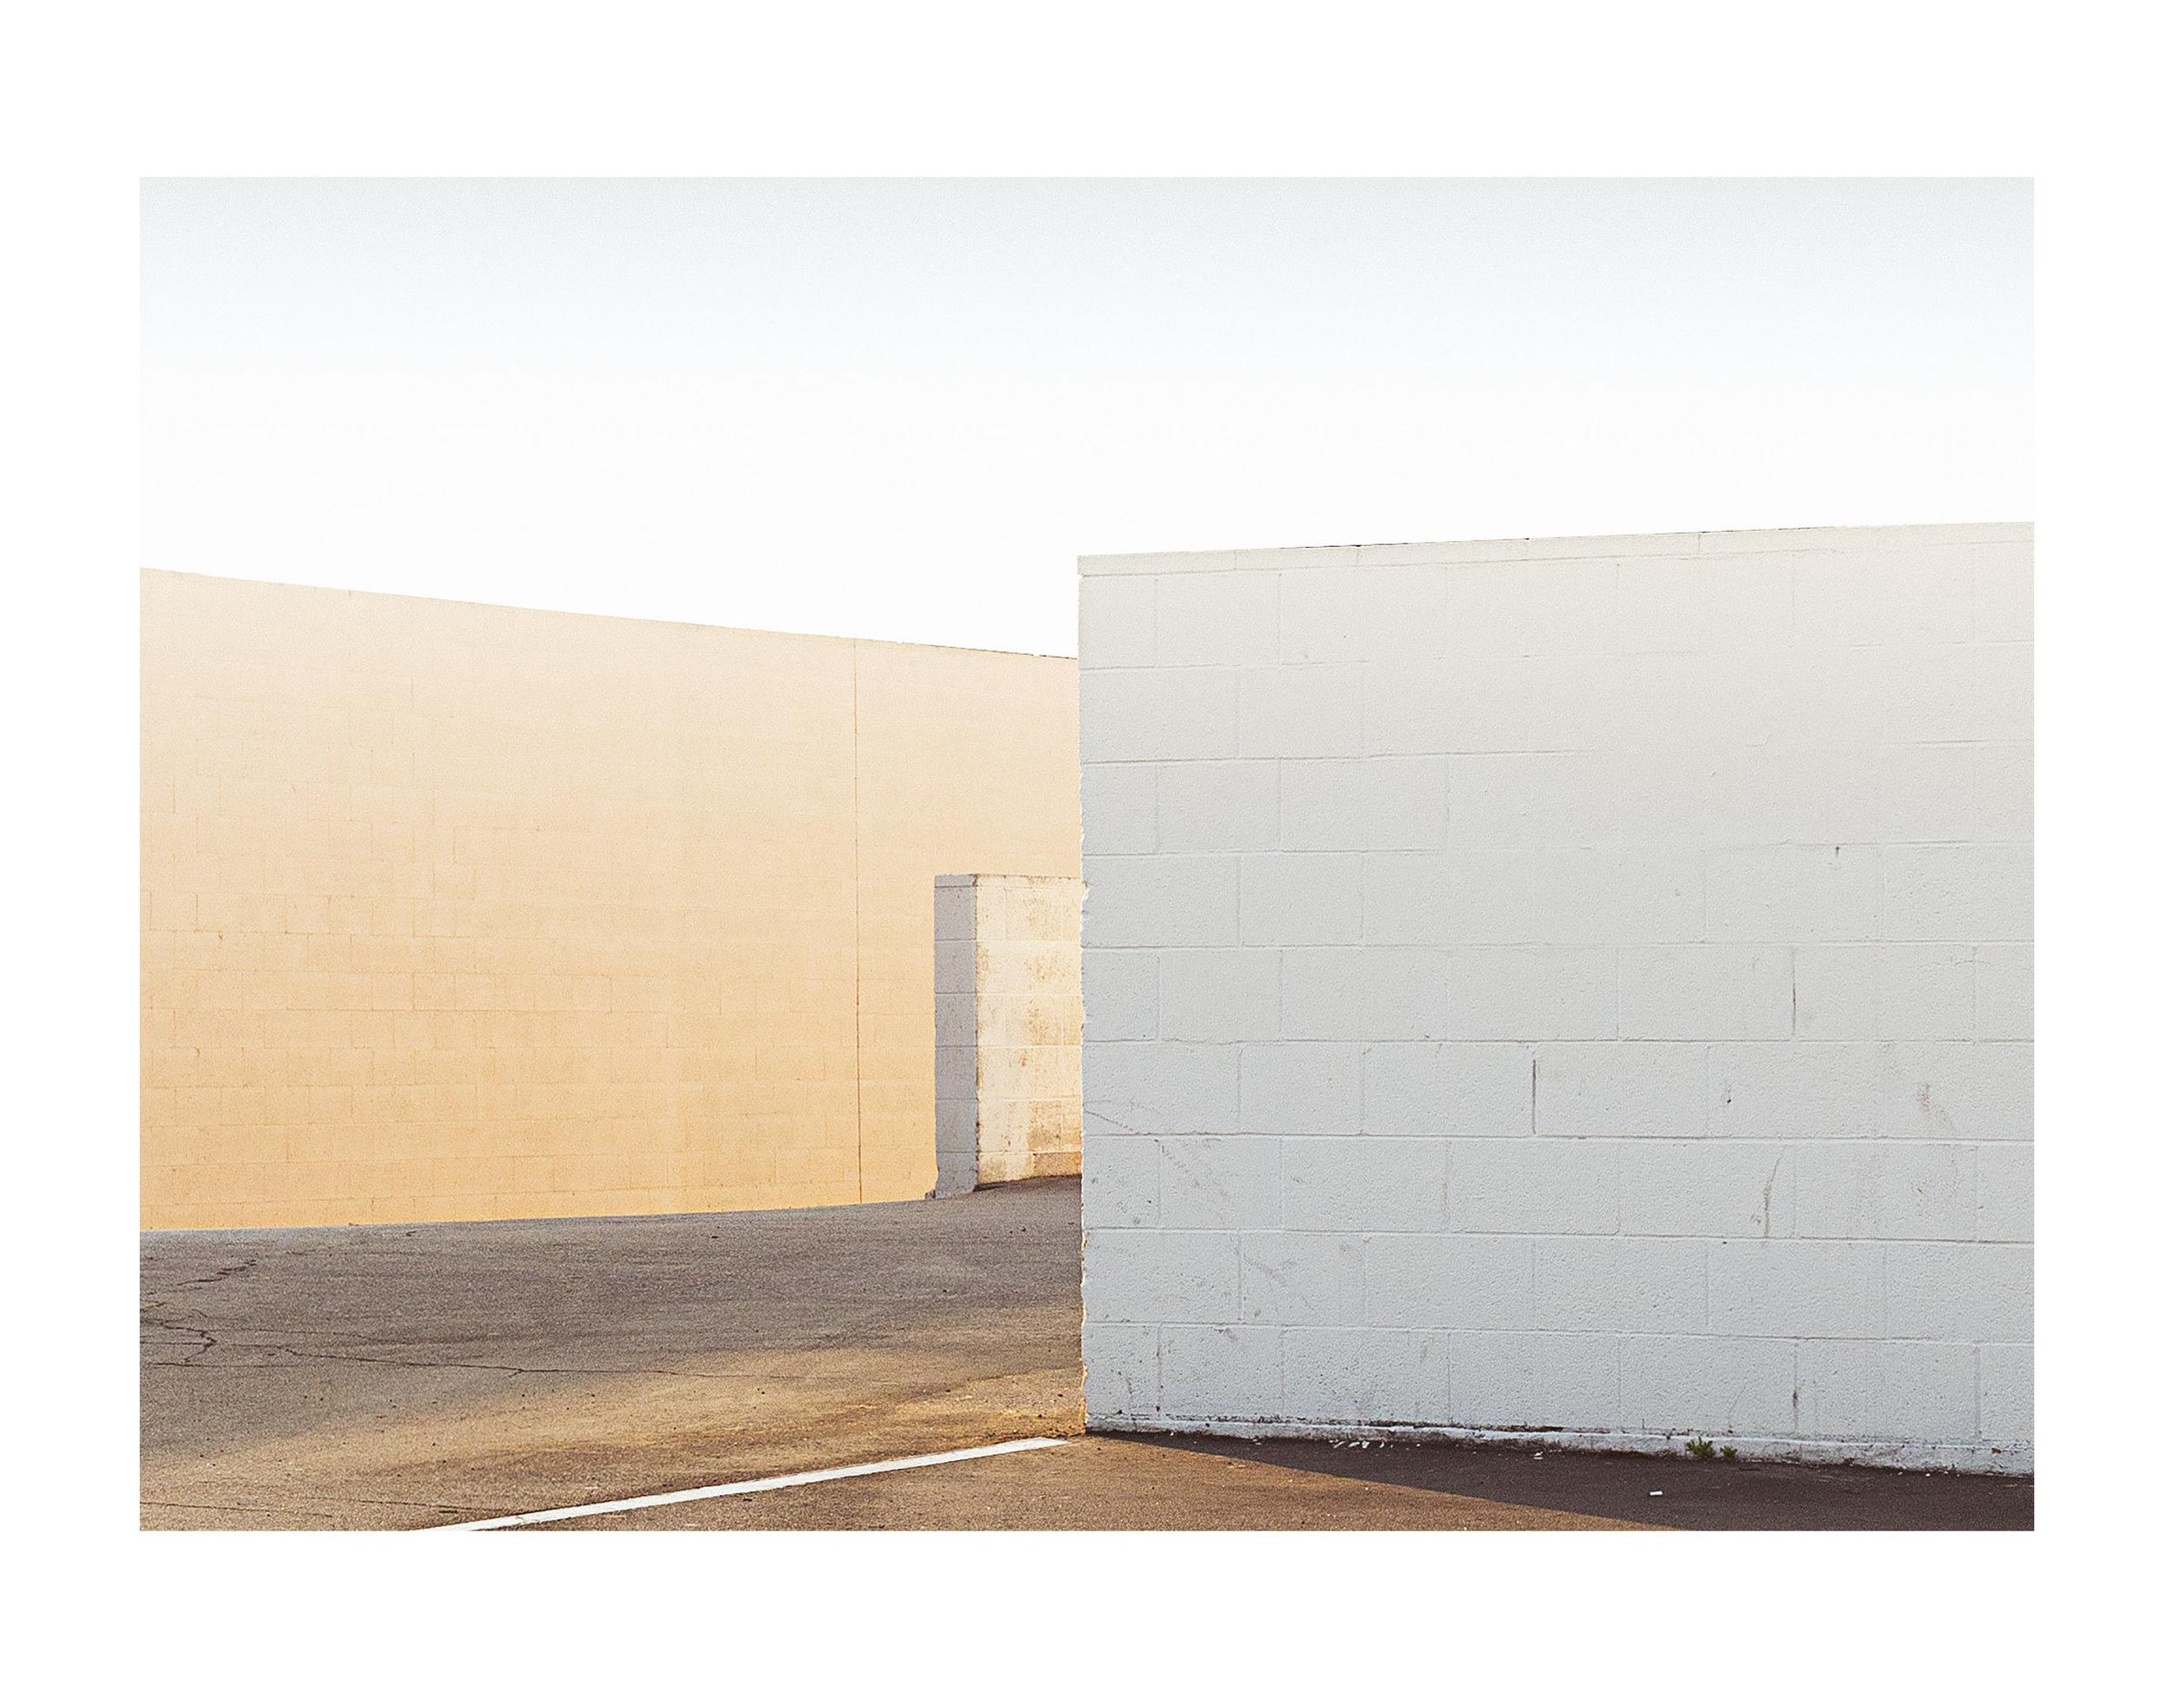 Gold Blocks; Santa Fe Springs,CA 2016